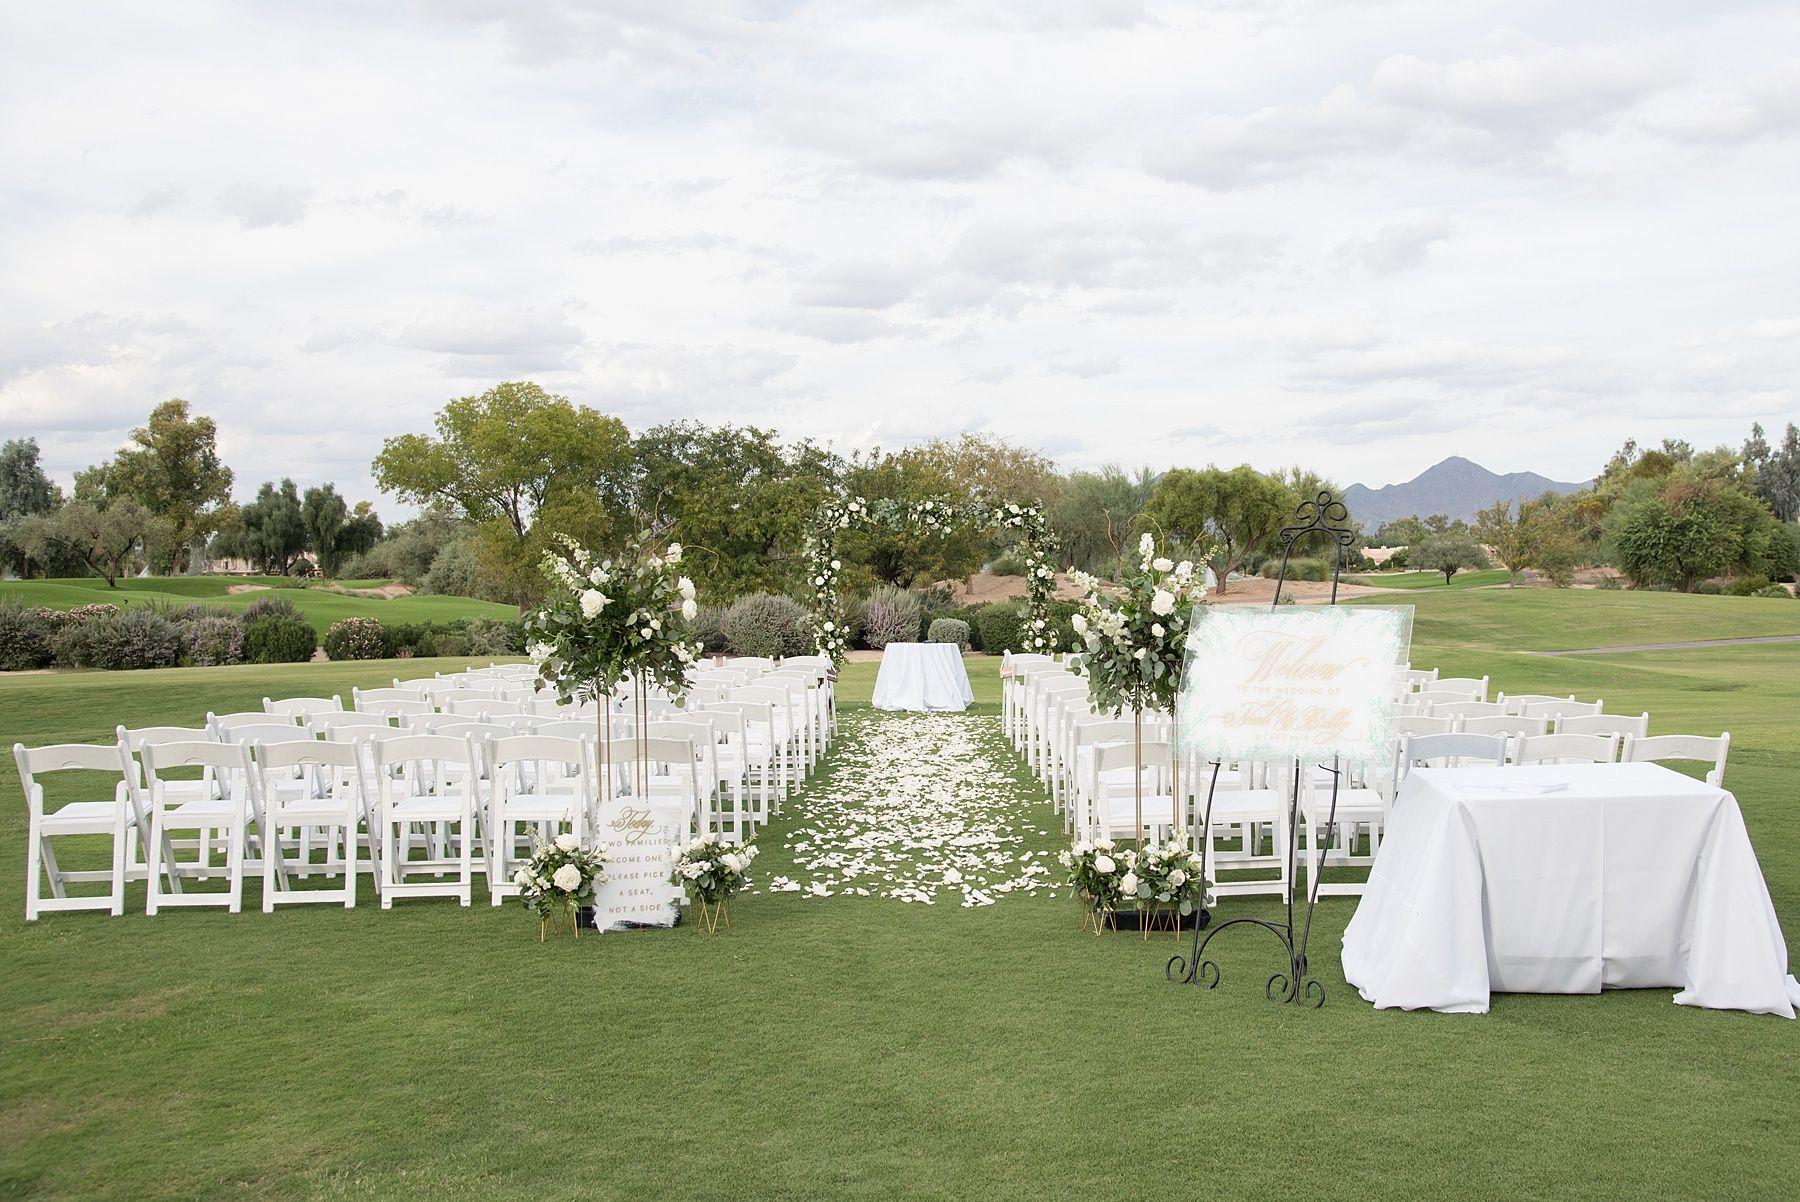 Golf course wedding ceremony site golf course wedding